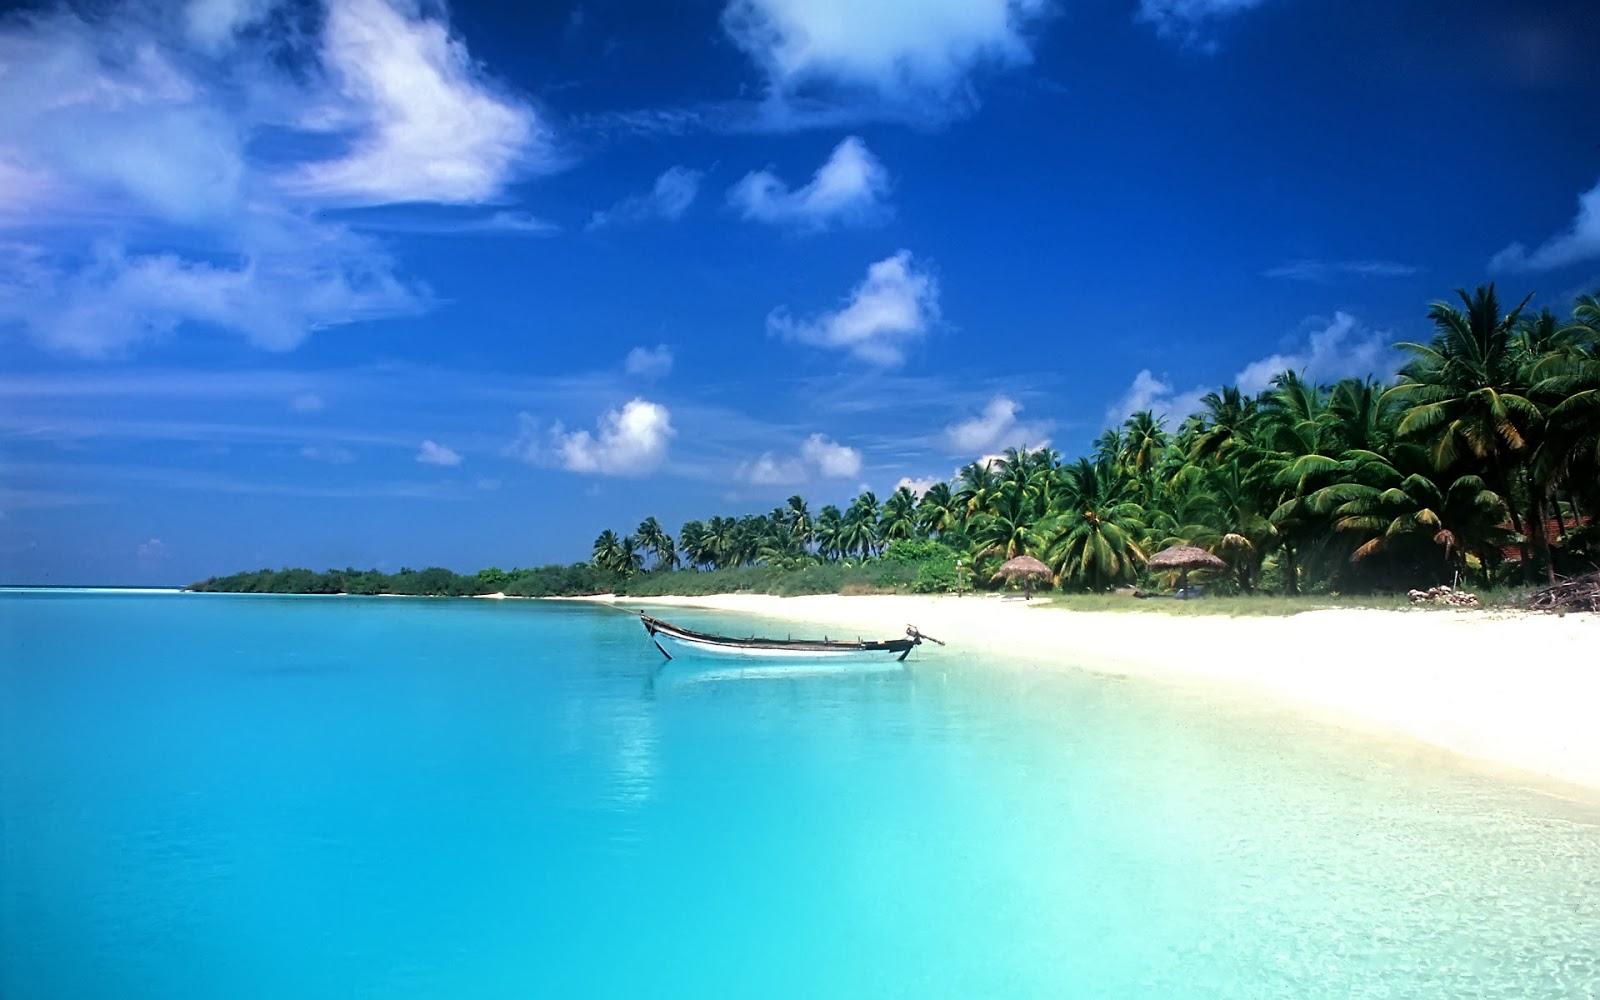 Beach-Boat-Colva-India